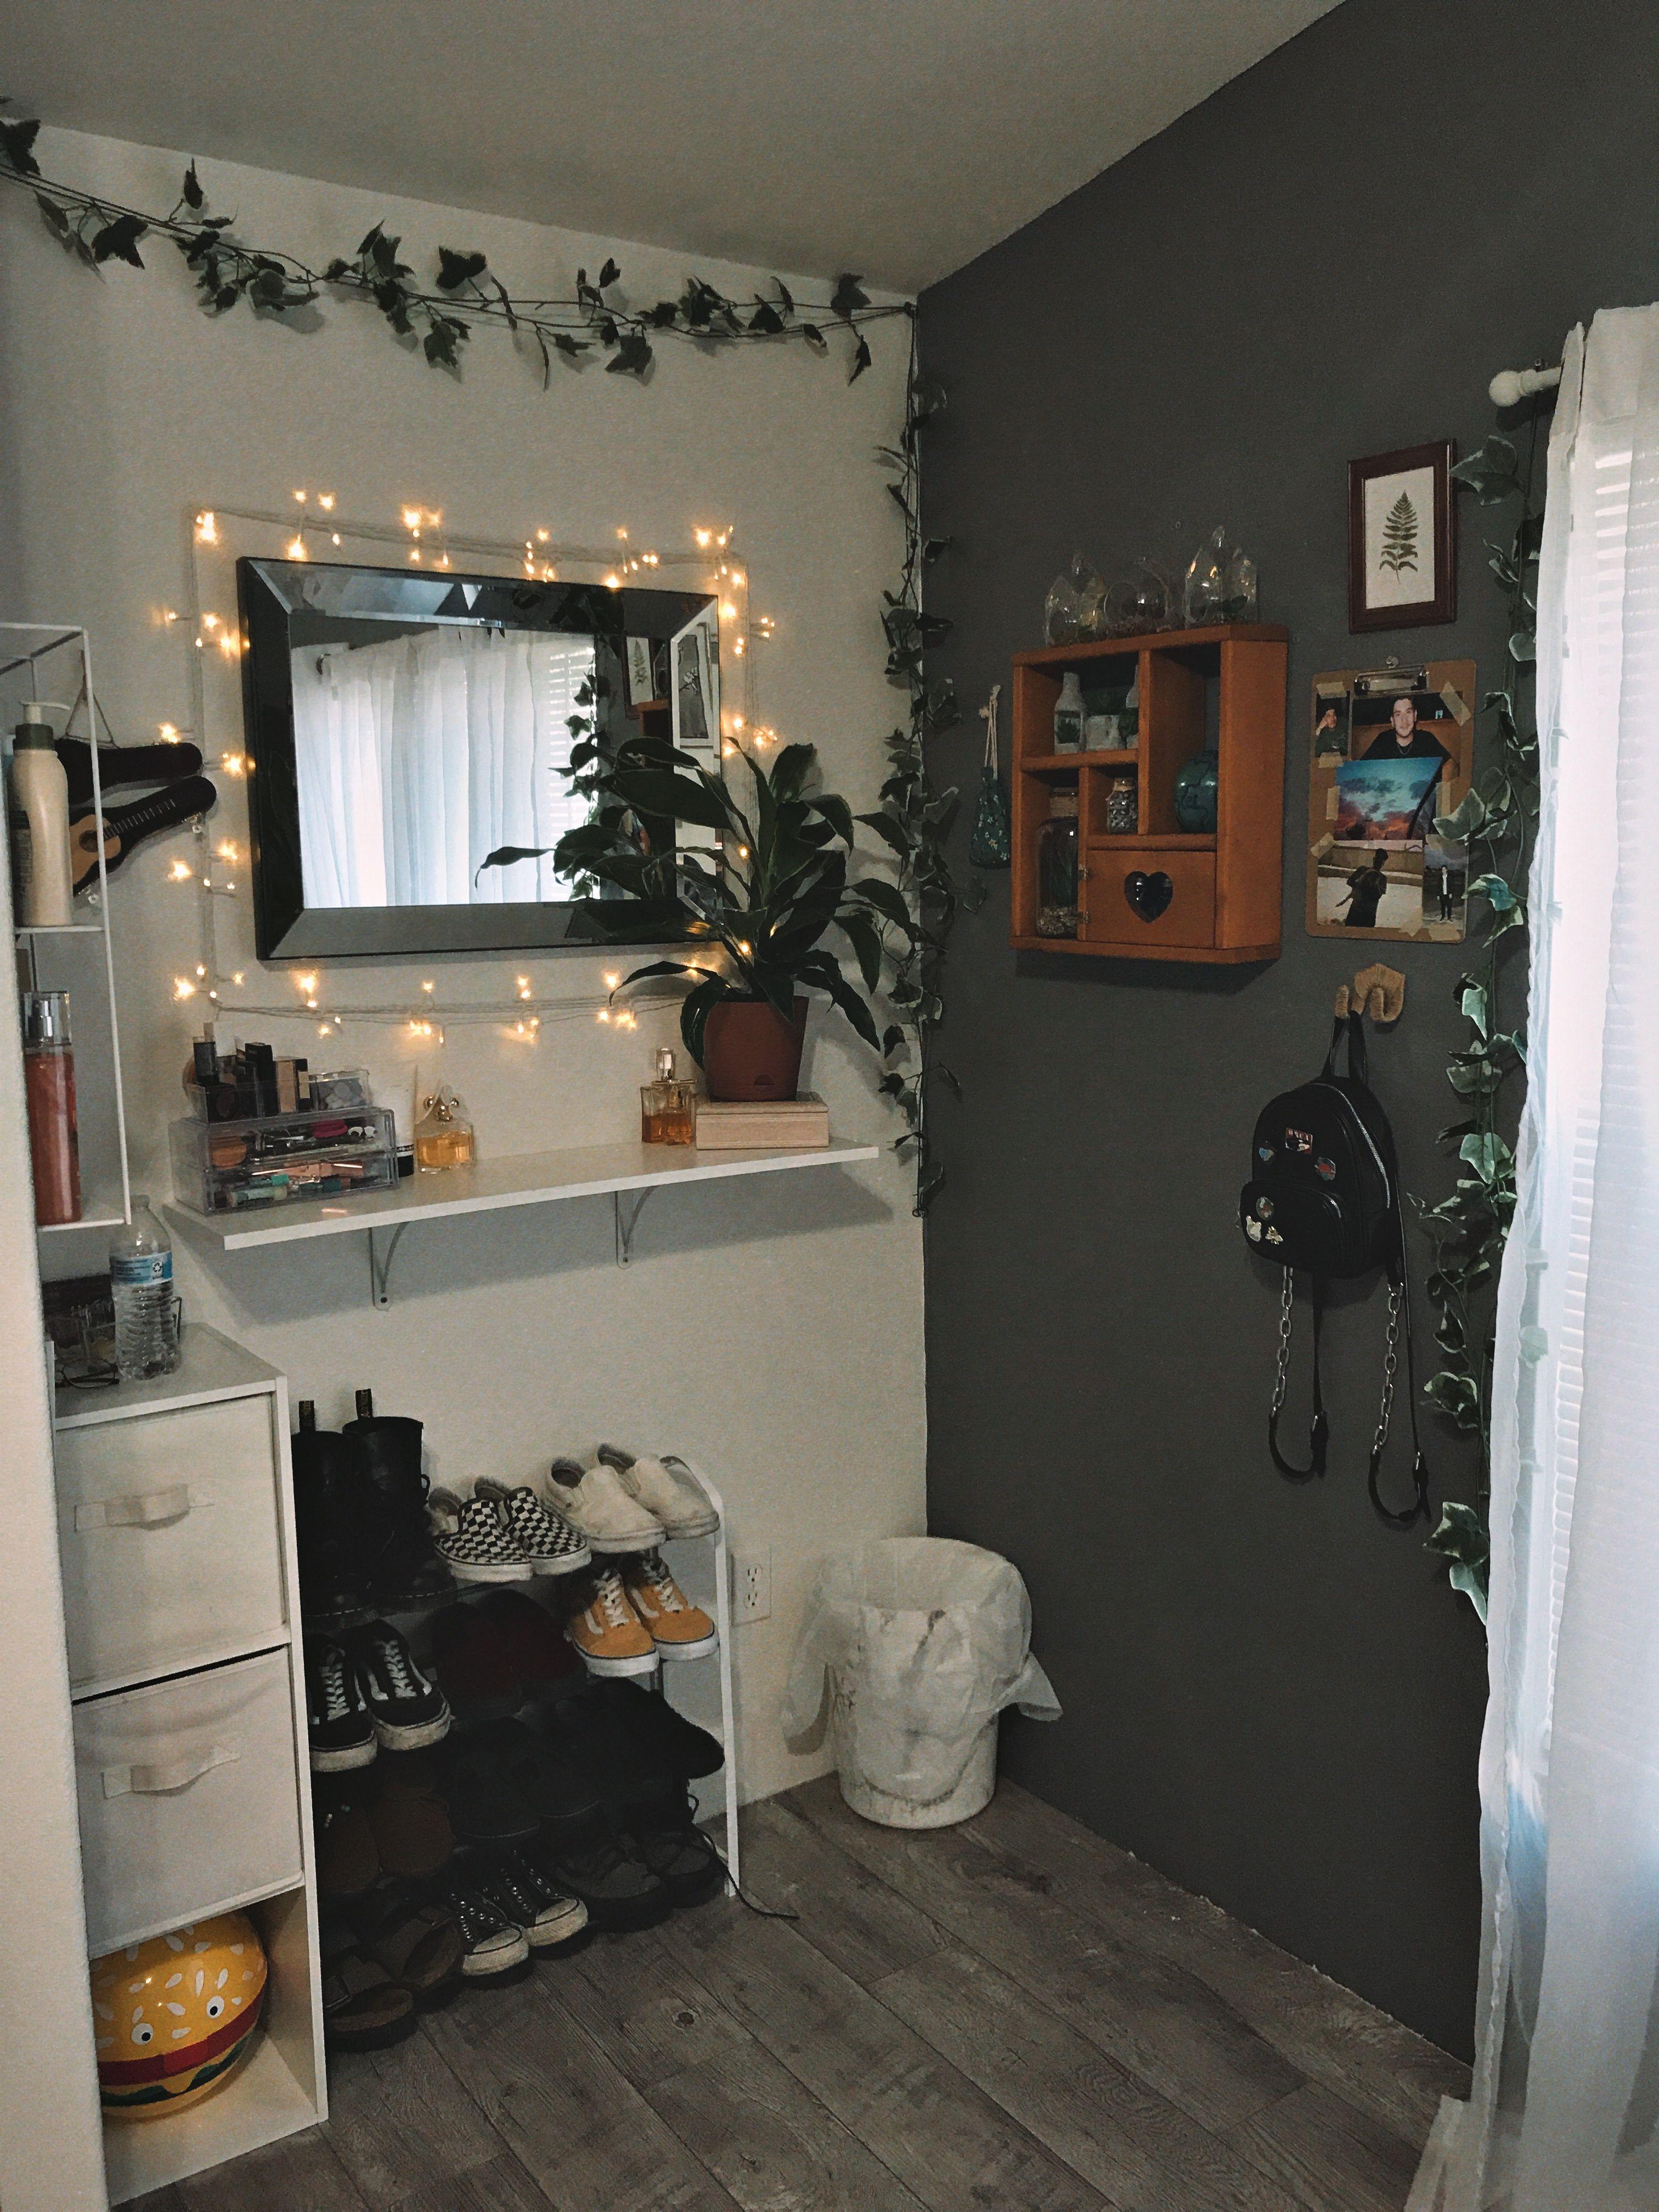 fairy lights, aesthetic, shelf, vanity, pictures, plants